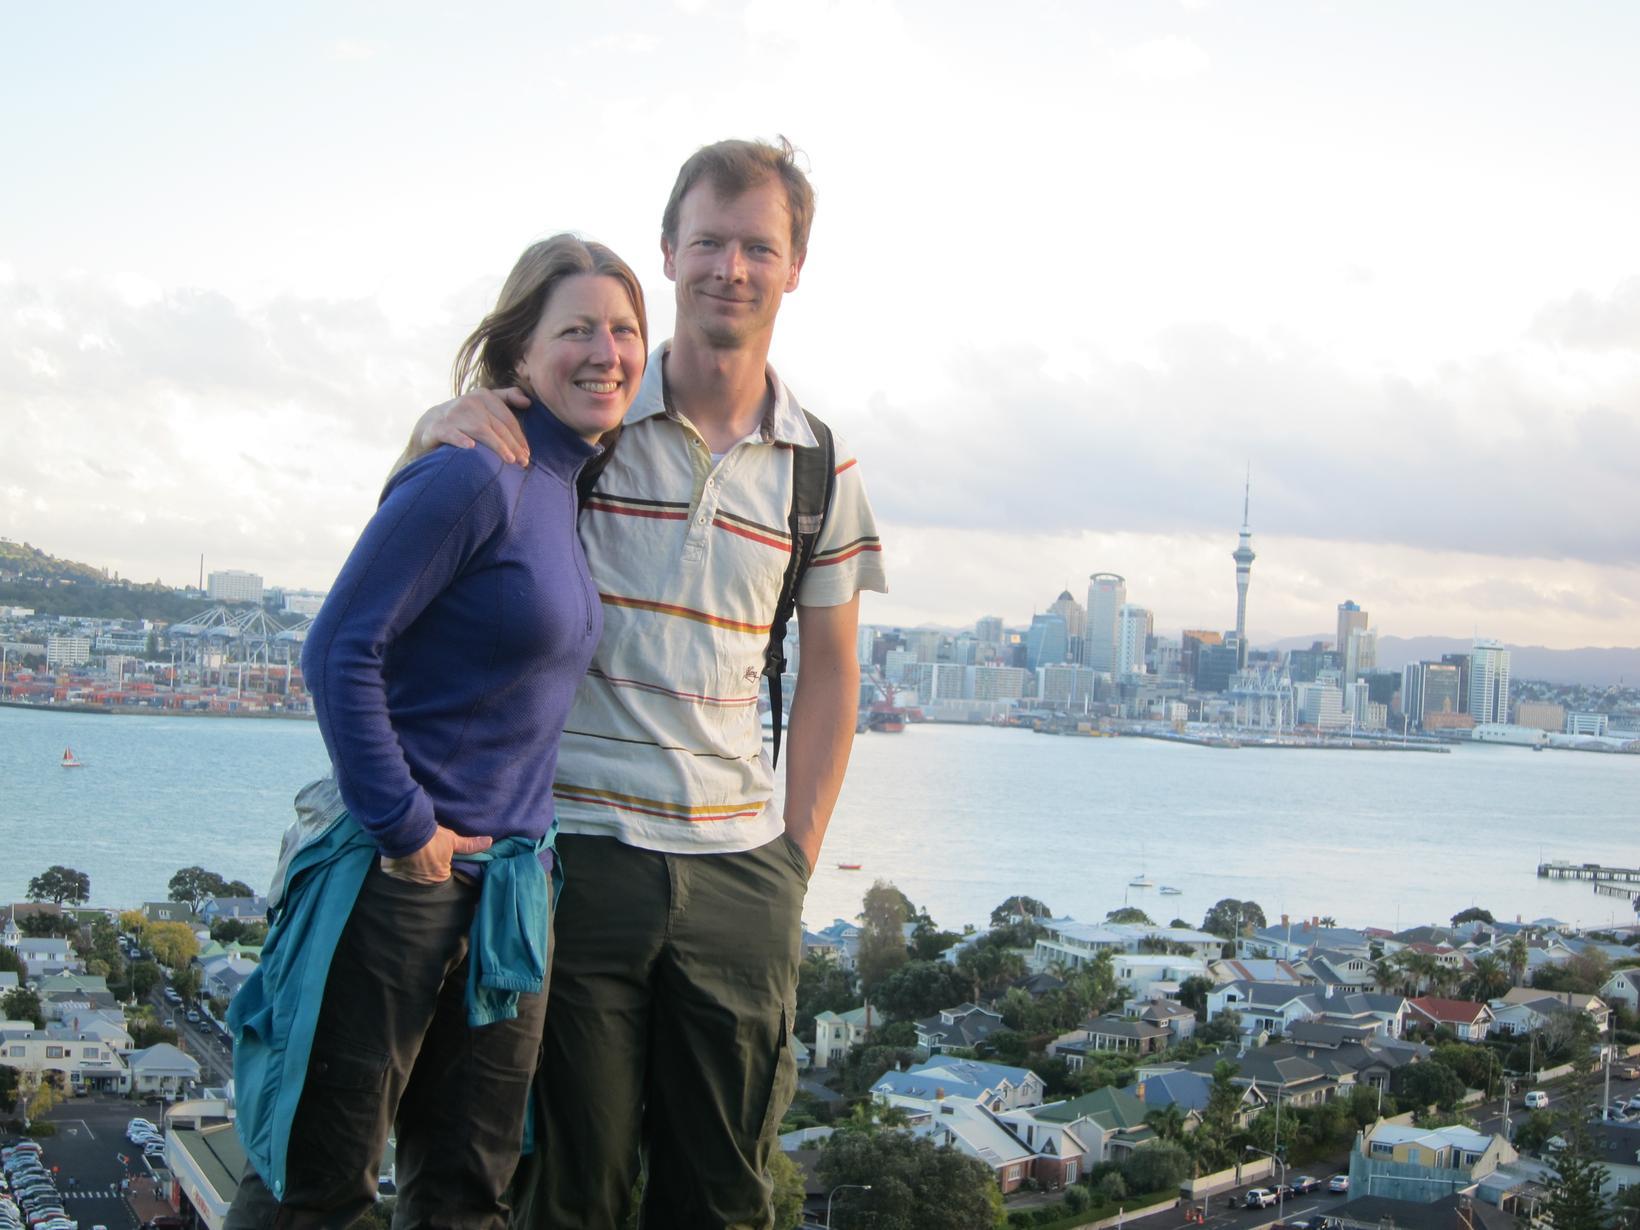 James & Janice from Cardiff, United Kingdom